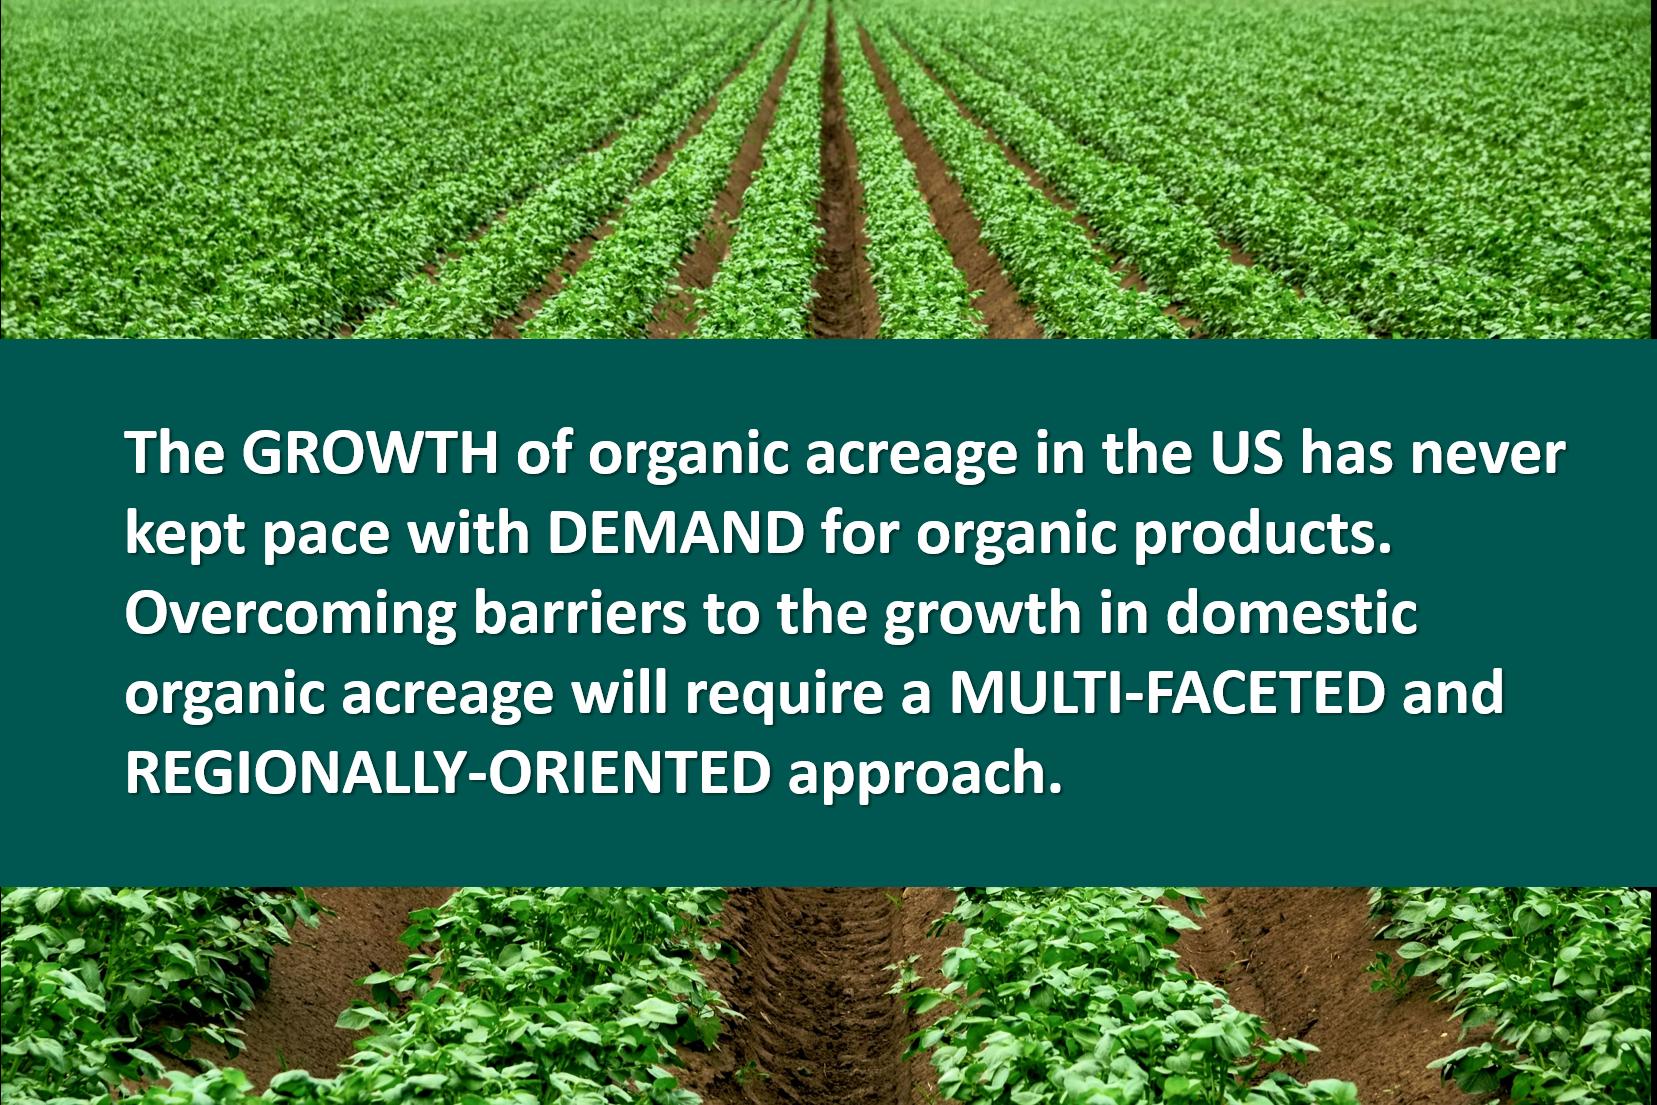 Organic trade association usda certified transitional program ota organic trade association usda certified transitional program xflitez Choice Image